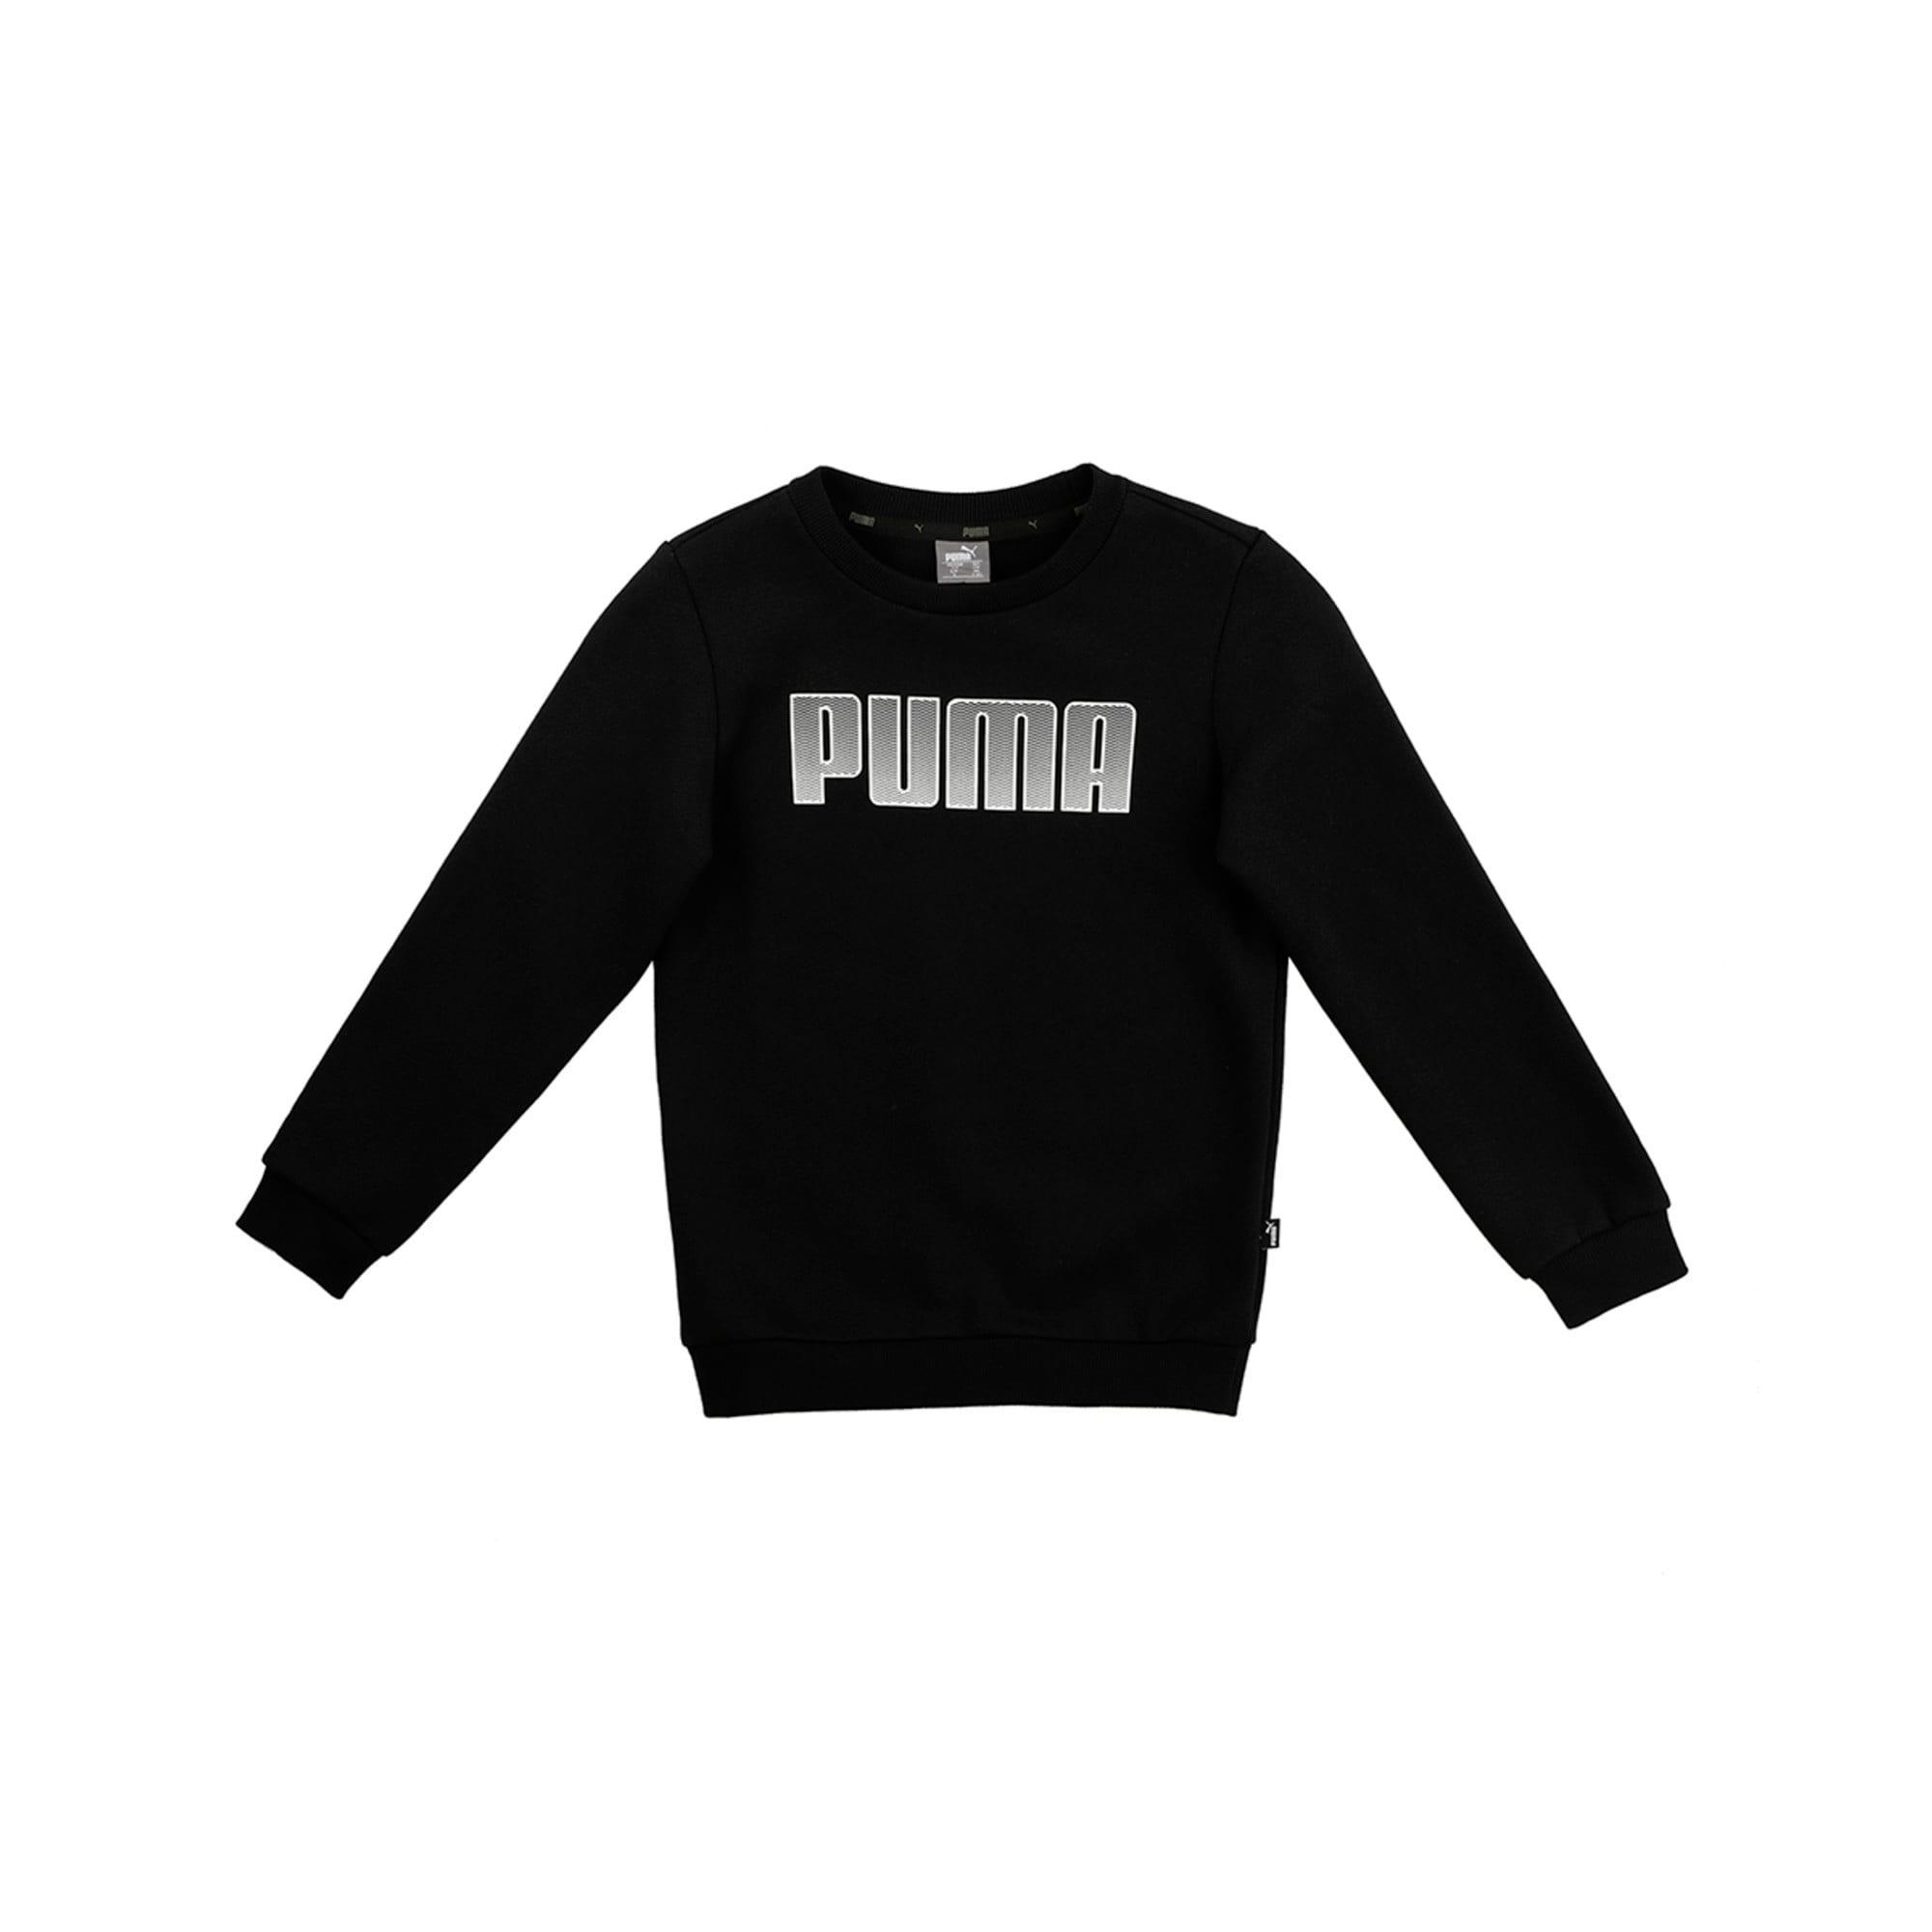 Thumbnail 1 of Boys' Crew Neck Sweater, Puma Black, medium-IND